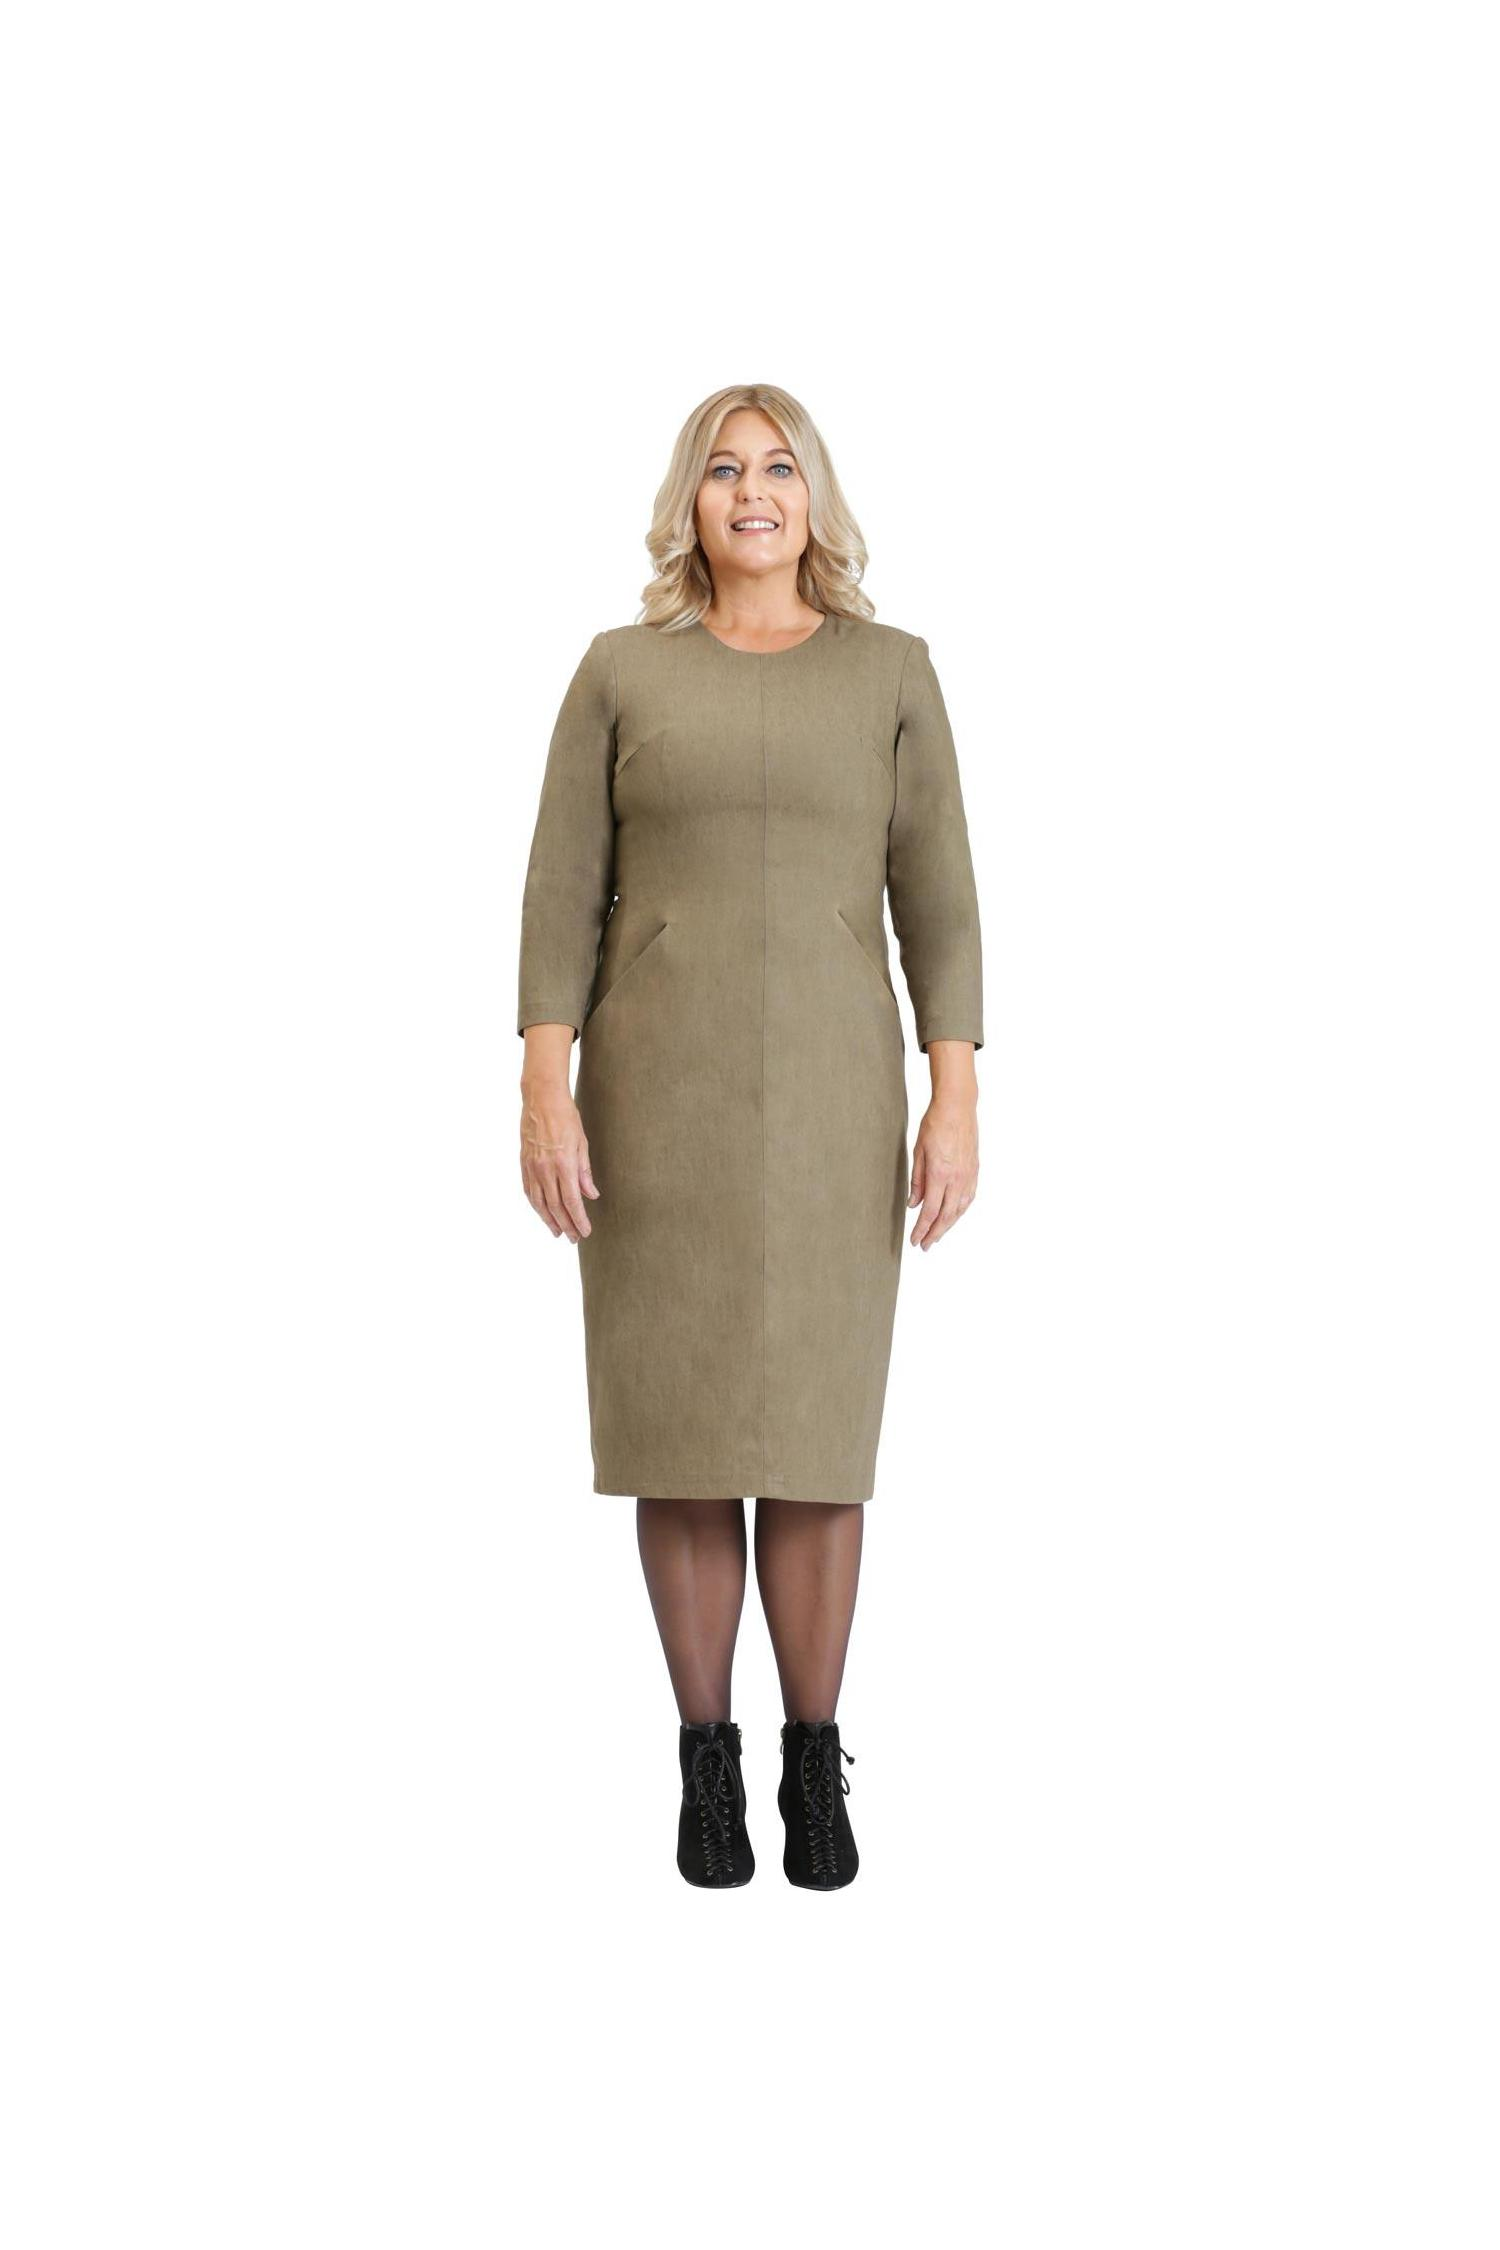 Smart copper dress